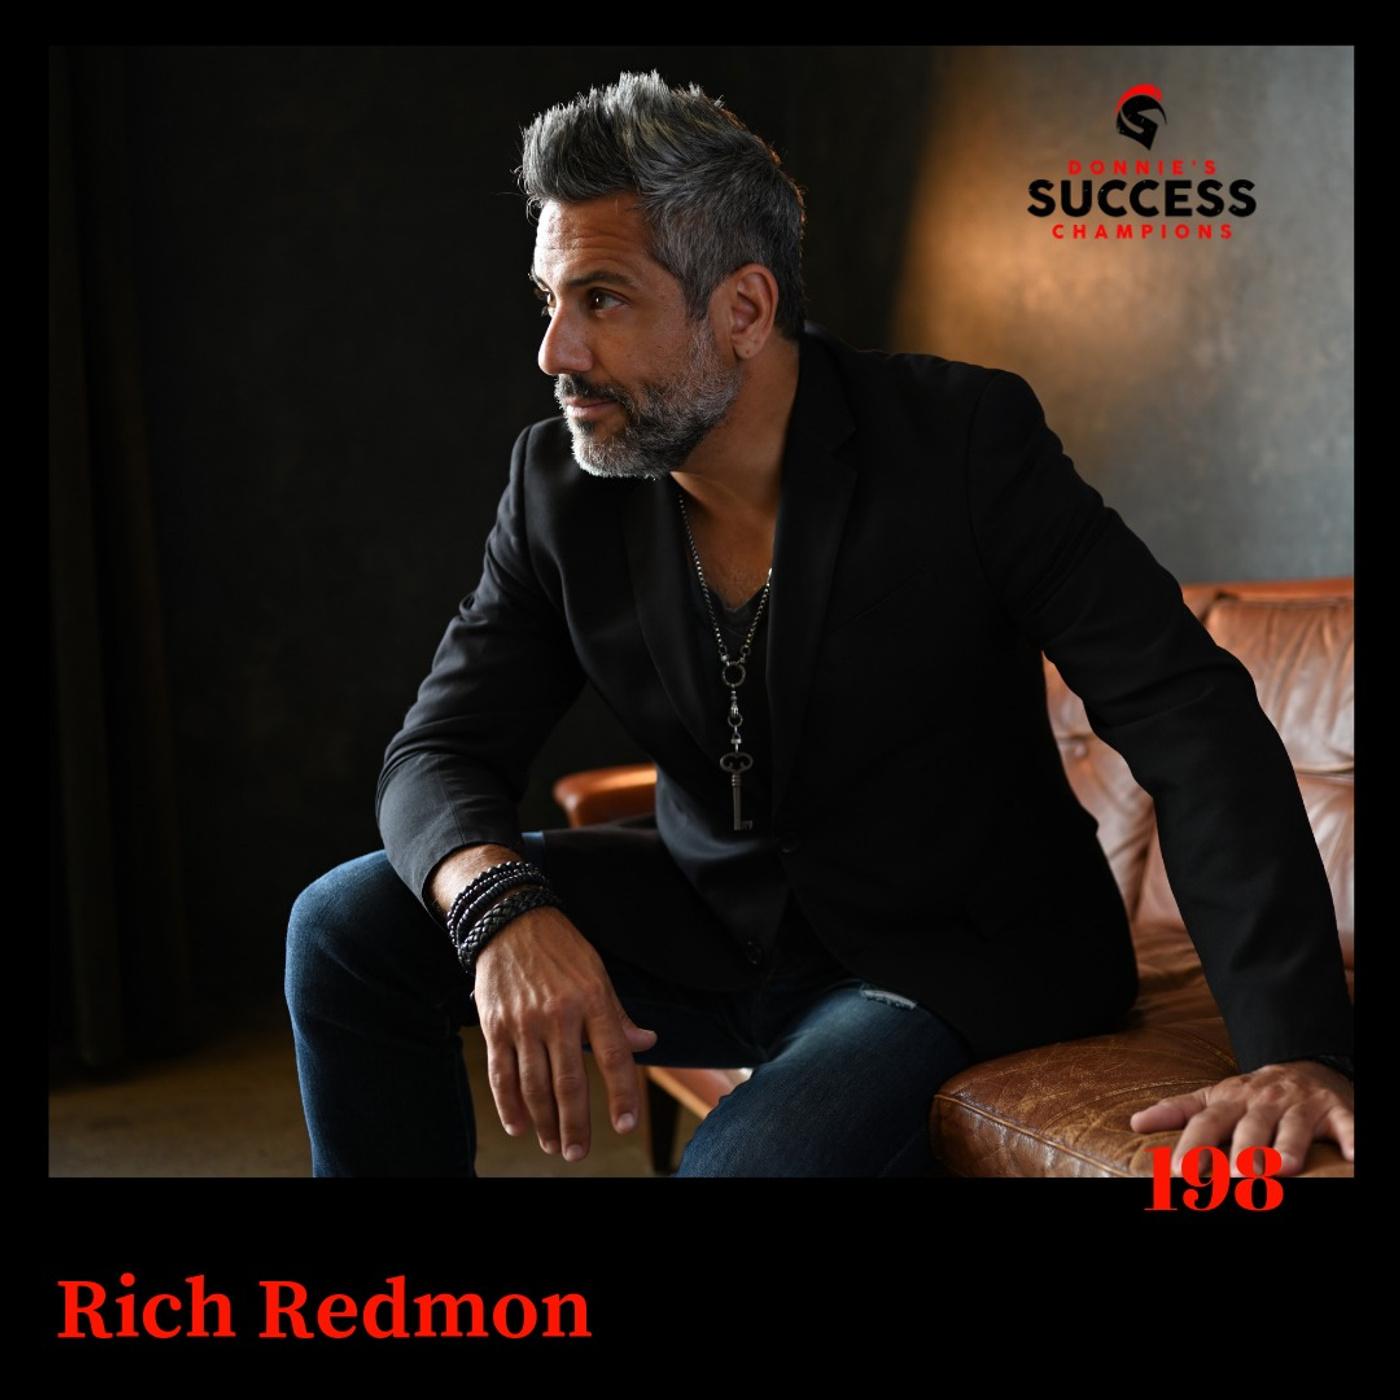 EP: 198 Rich Redmond In Demand Drummer, Motivational Speaker, Mentor and Teacher